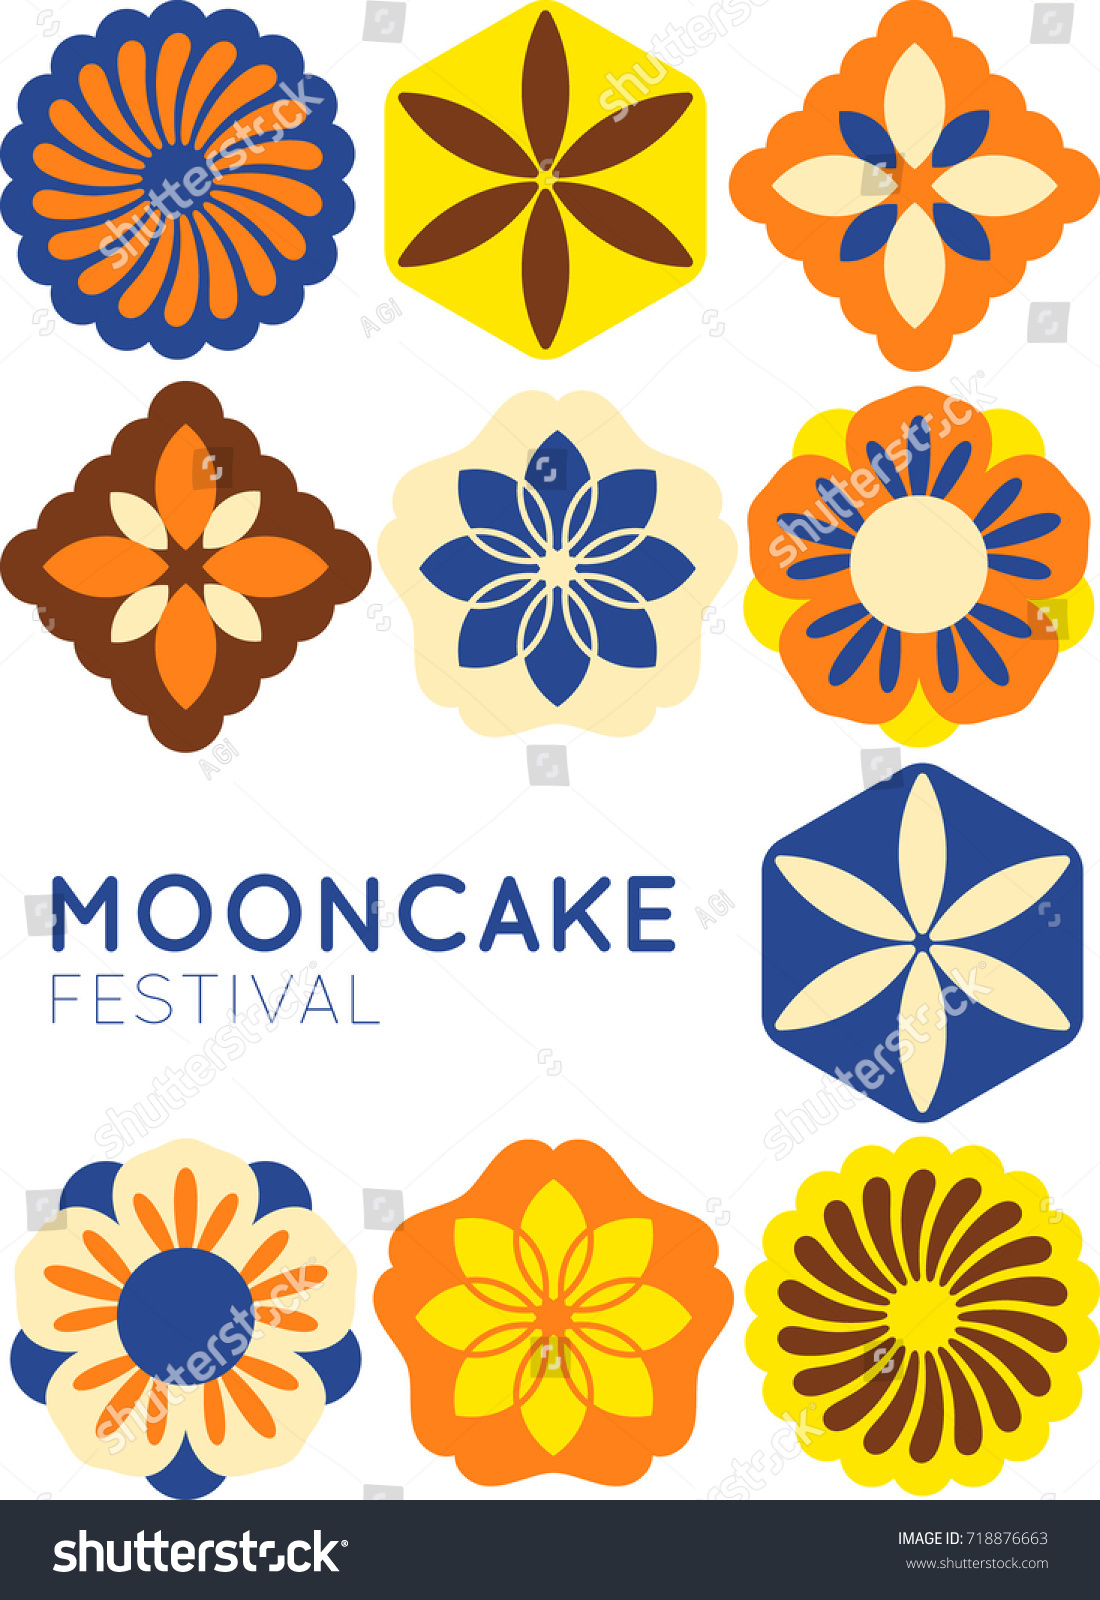 Mooncake drawings 297 best mooncakes images on pinterest mooncake mooncake drawings mid autumn festival moon cake design stock vector 718876663 kristyandbryce Choice Image